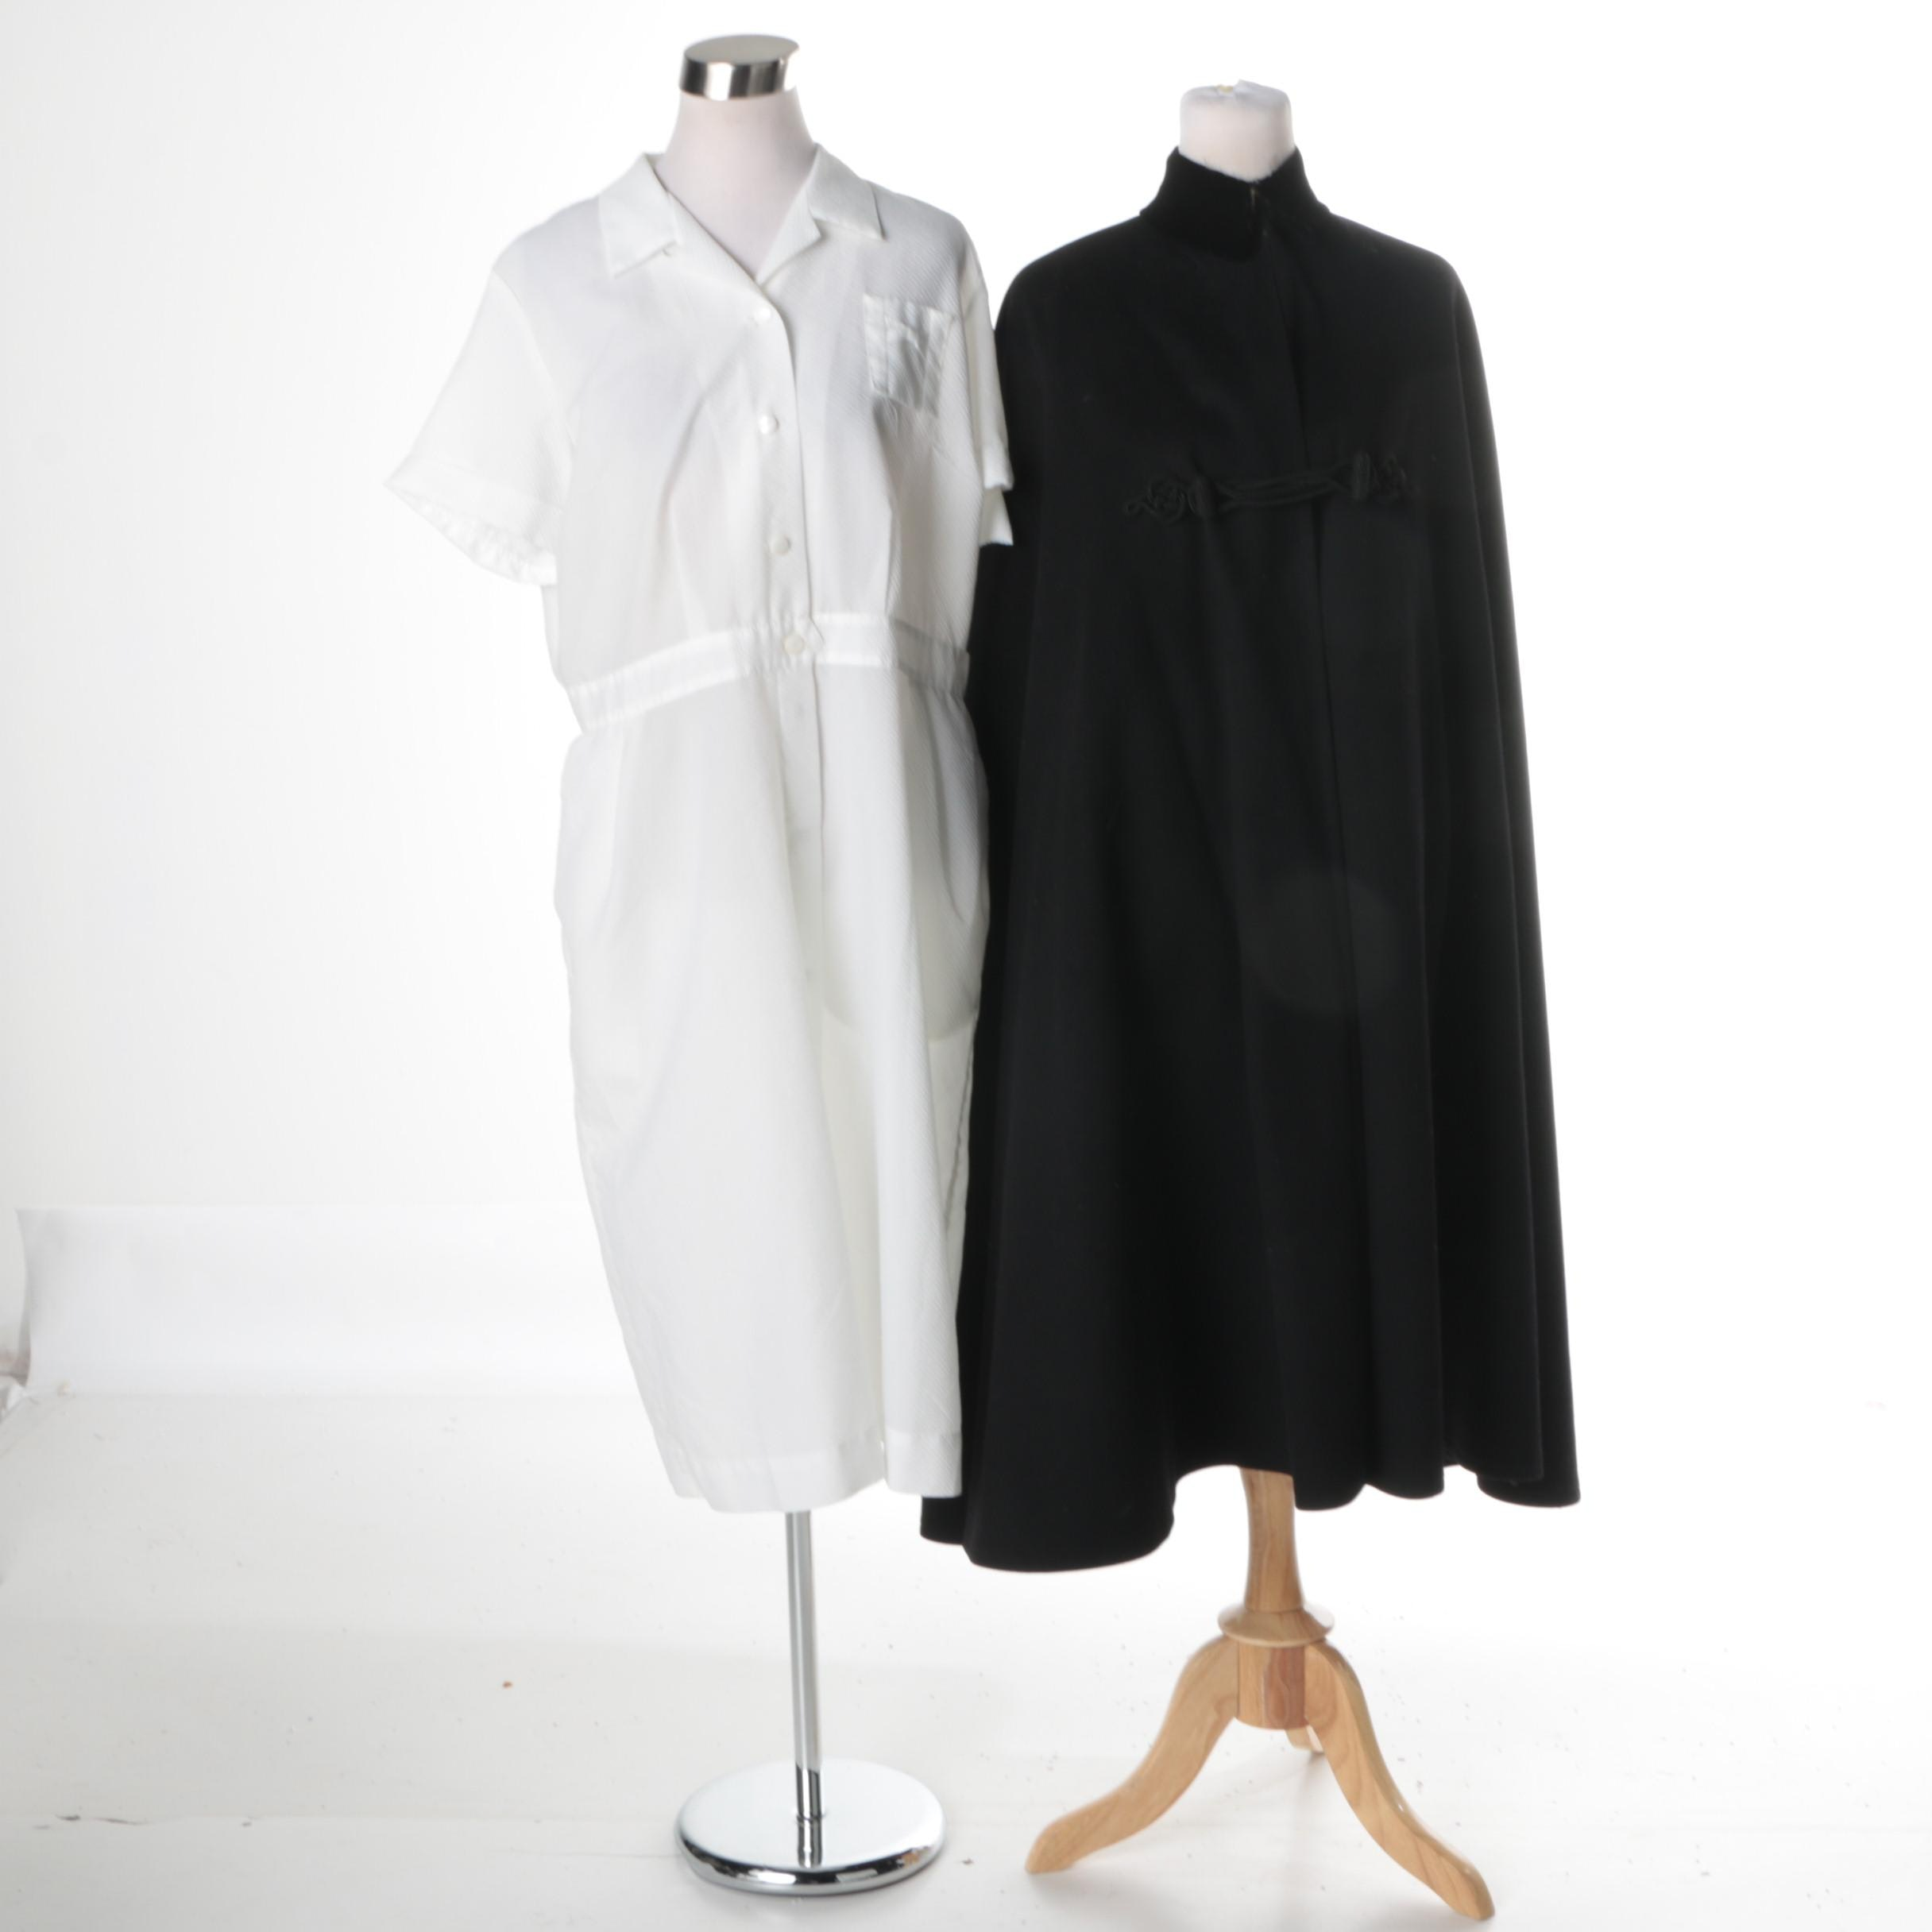 Vintage Nursing Uniform Dress and Black Wool Cape